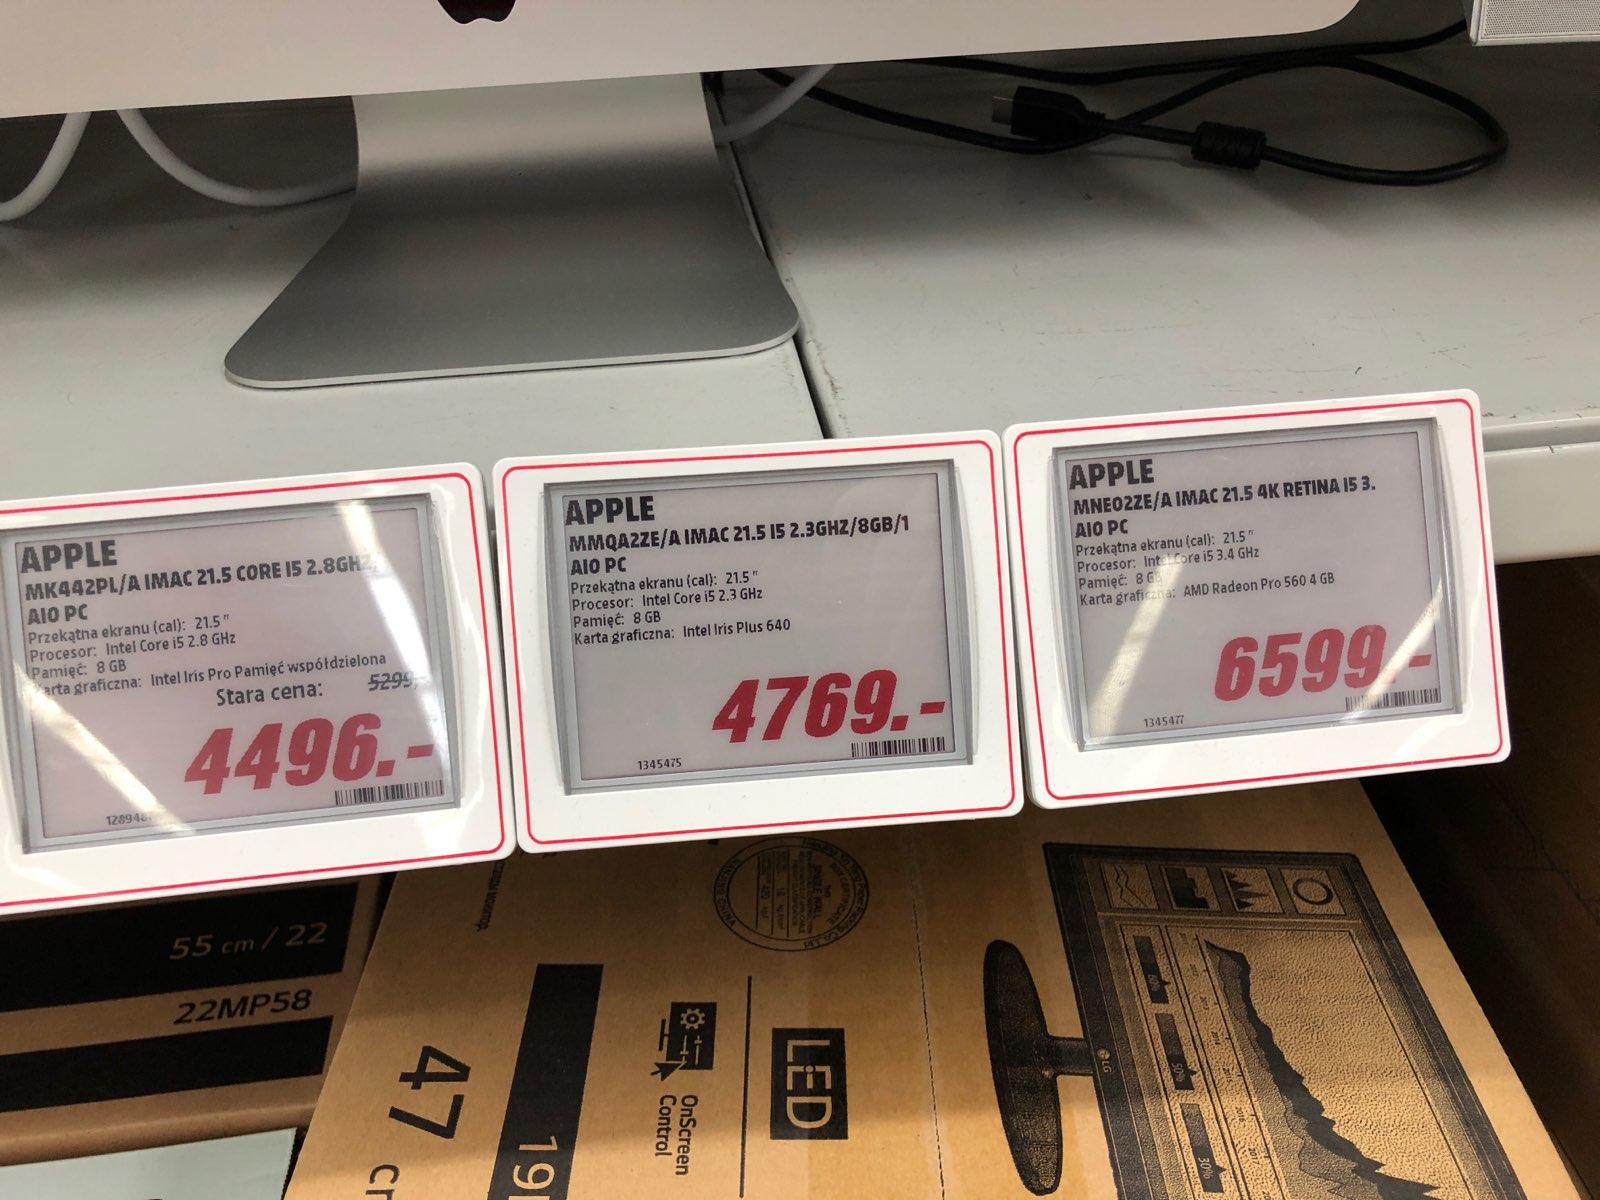 Apple iMac MK442PL/A